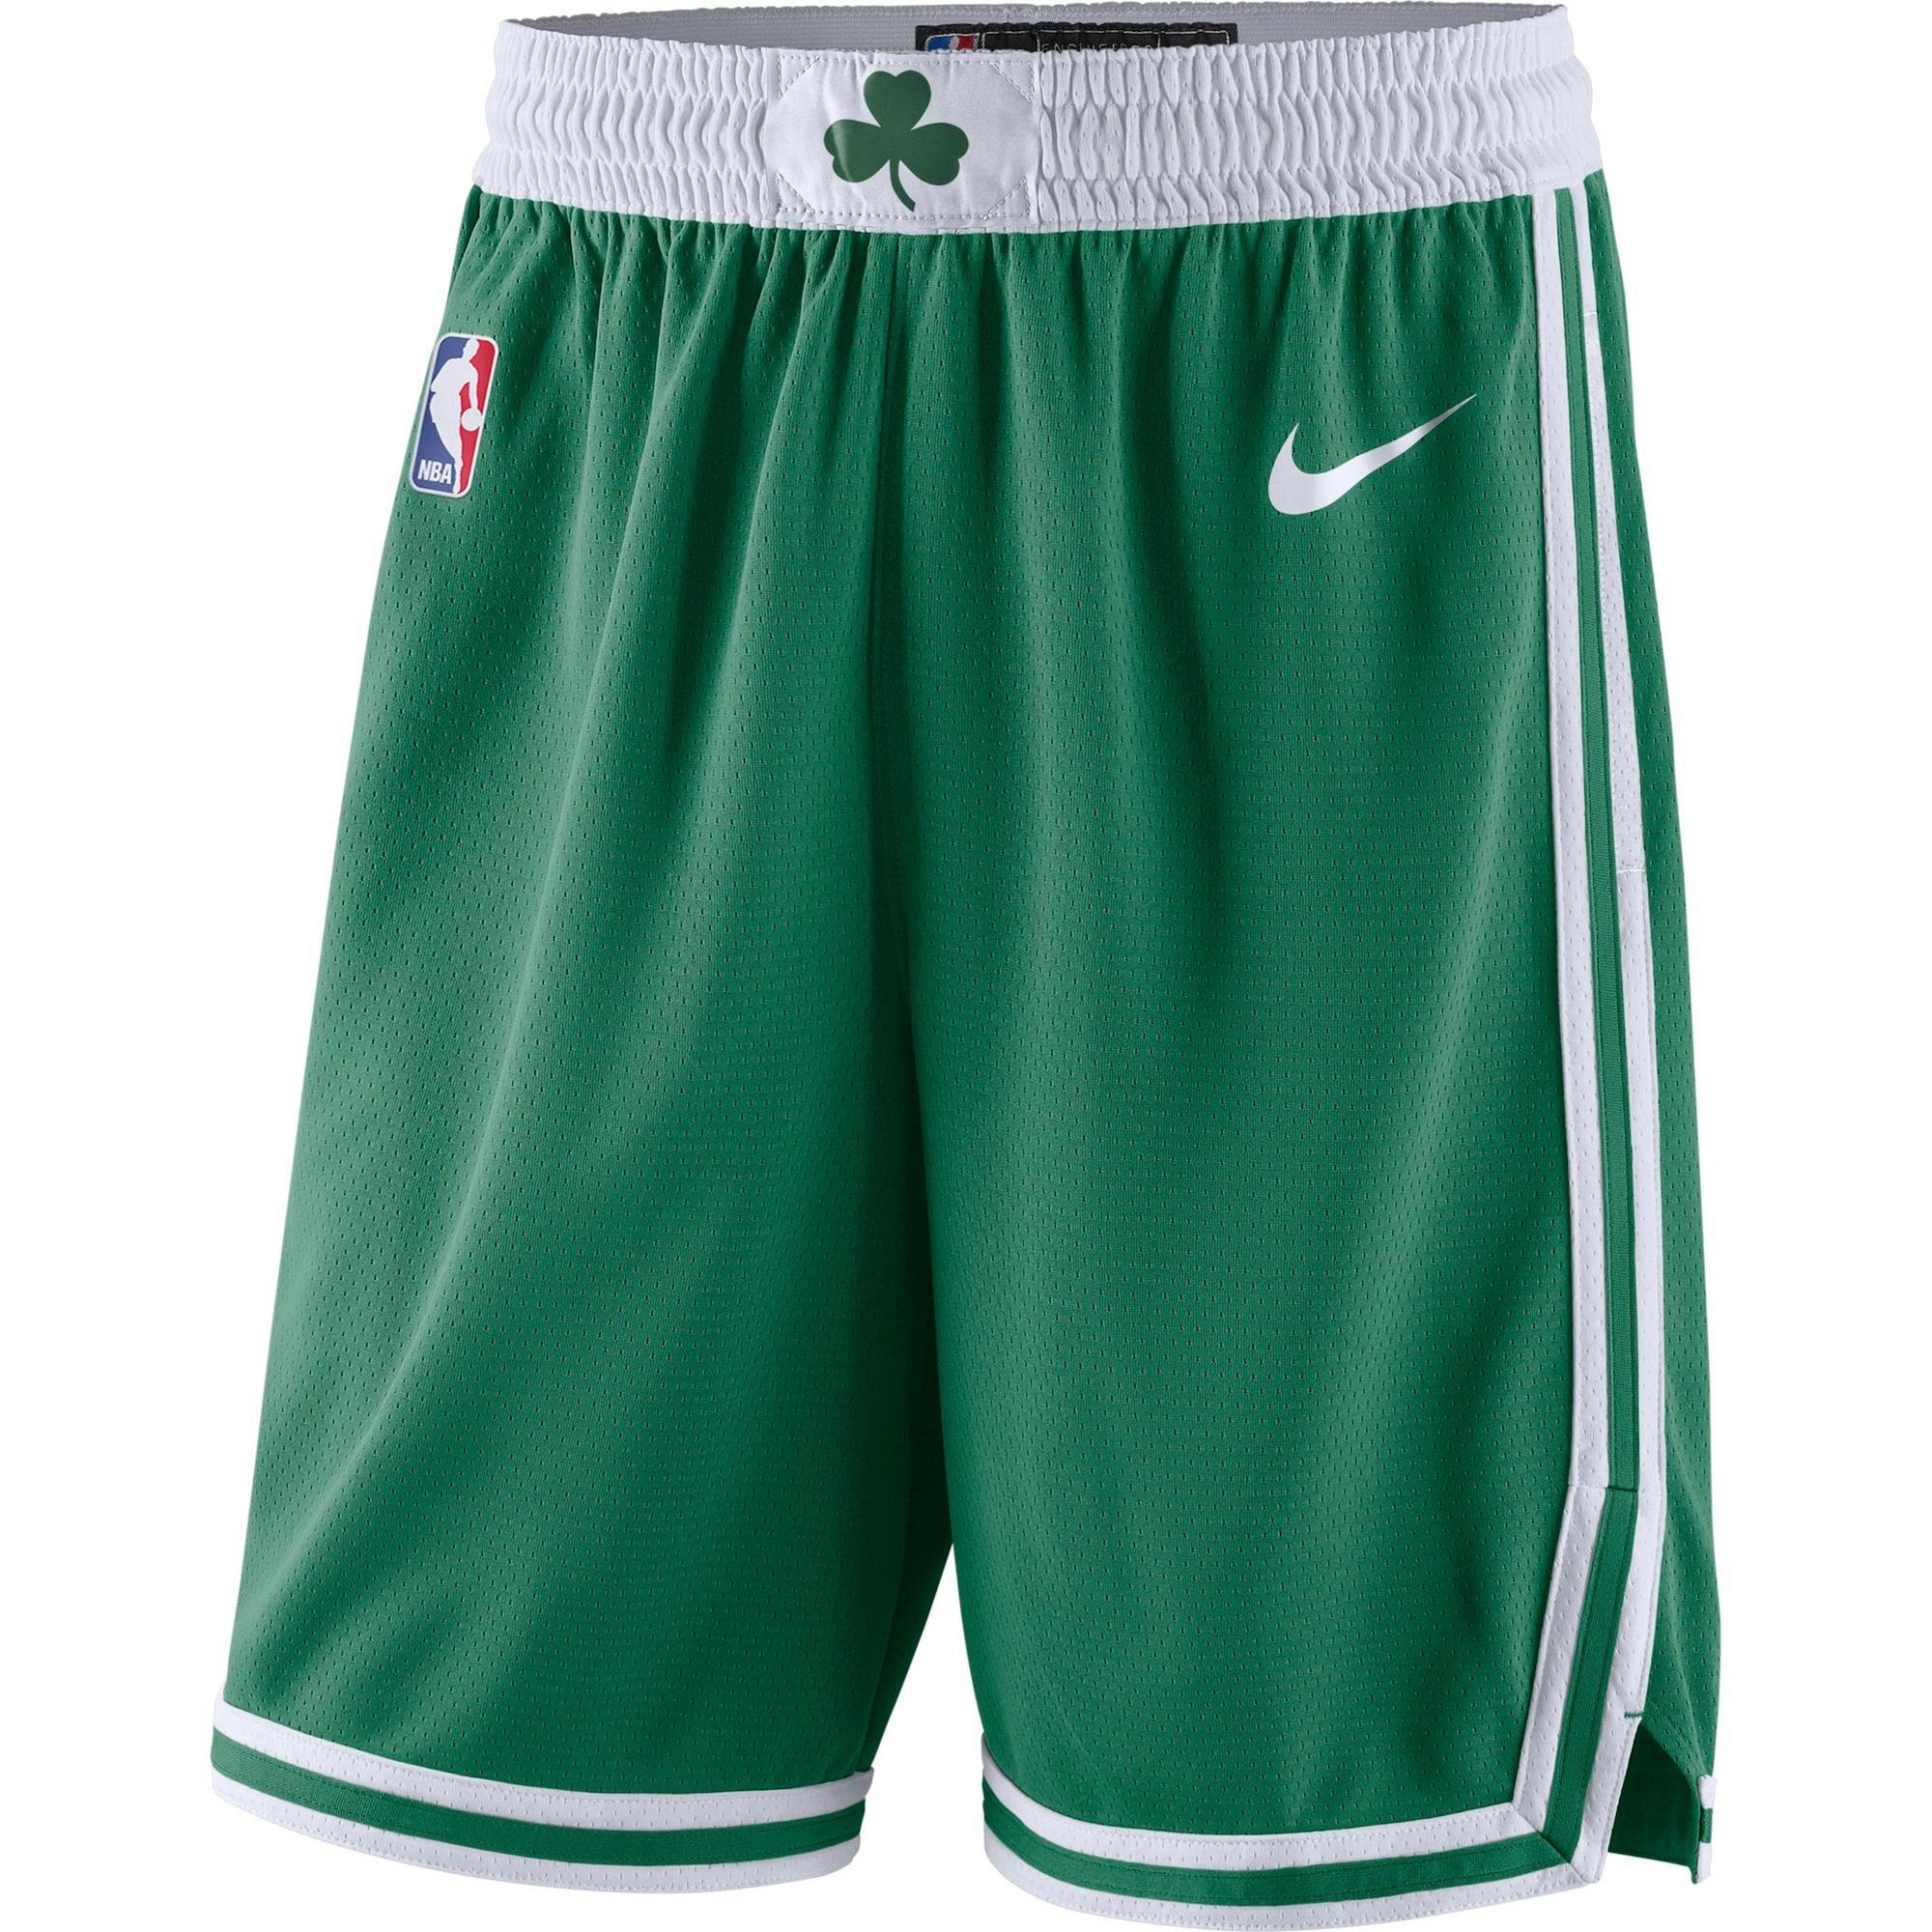 Basketball-Shorts 'Boston Celtics'   Sportbekleidung > Sporthosen > Basketballshorts   Nike